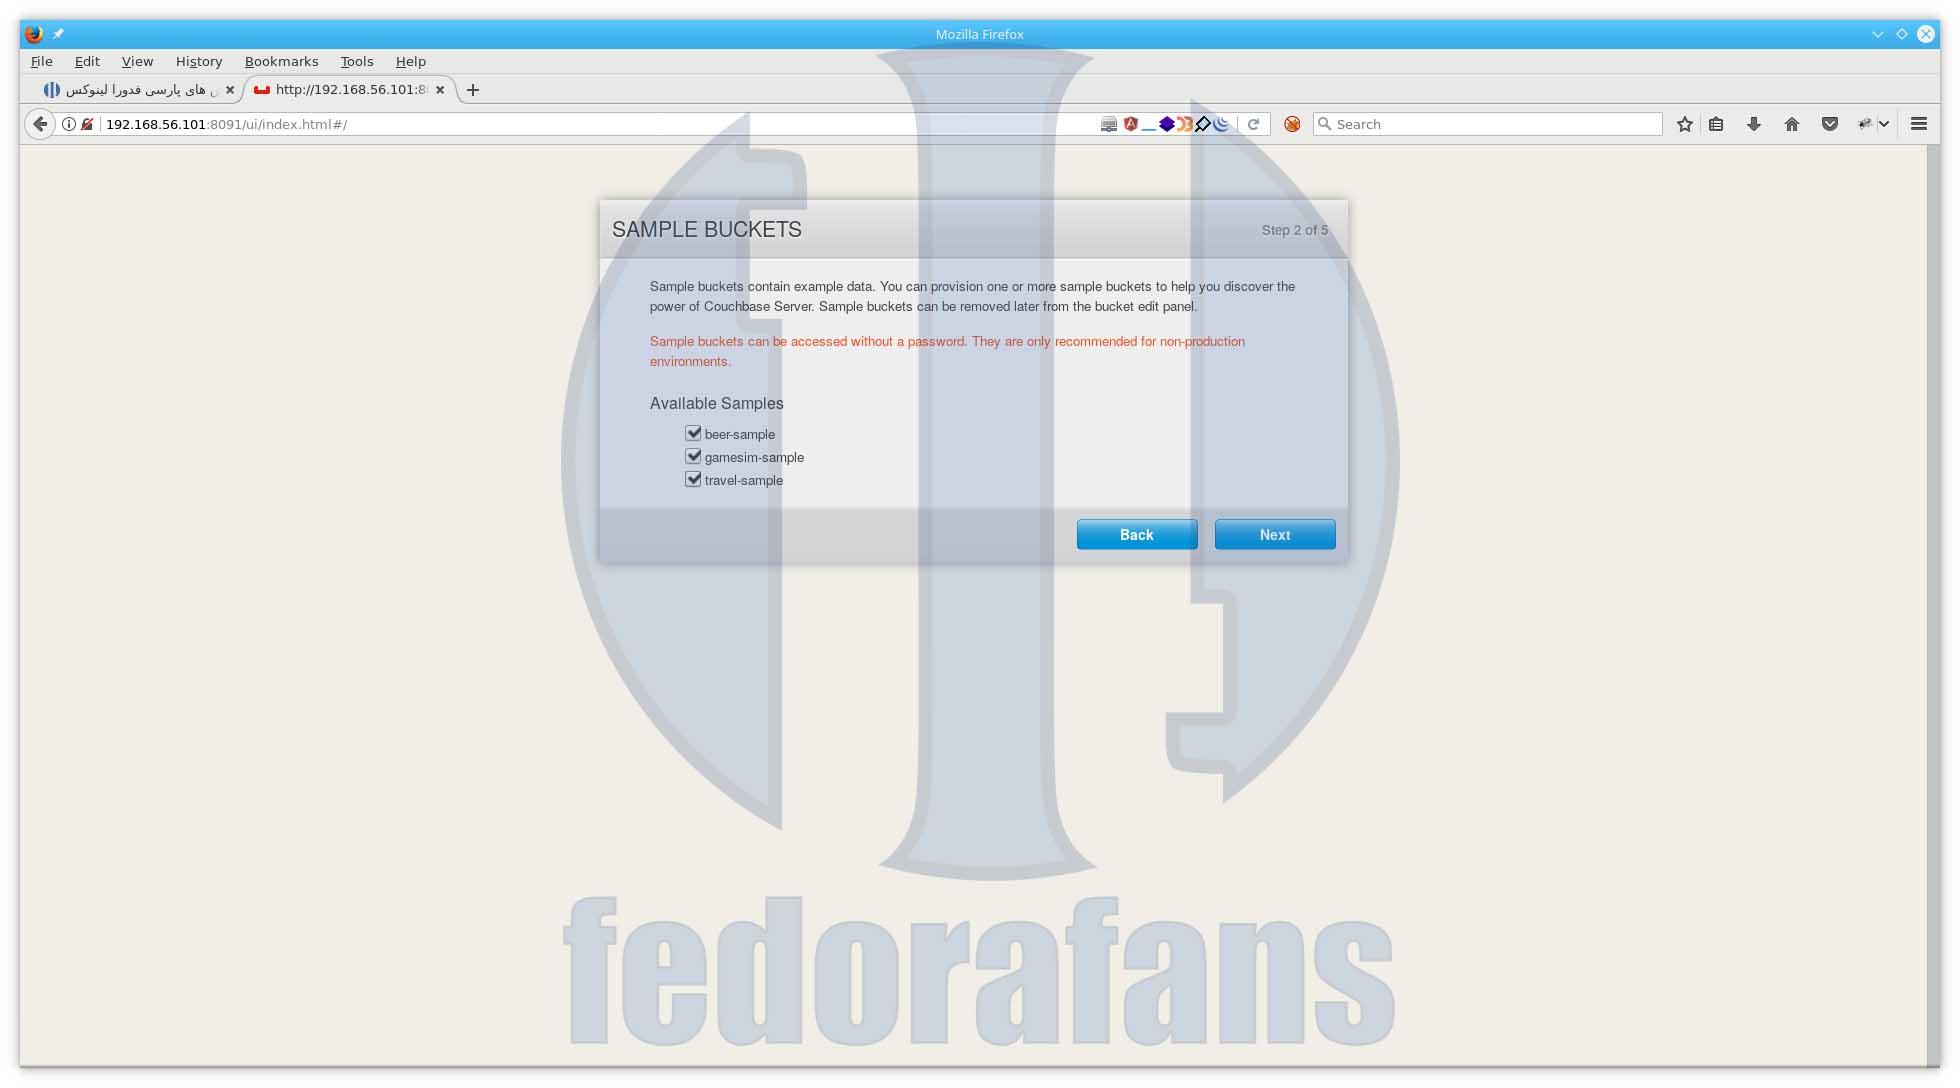 5-couchbase-server-fedorafans.com